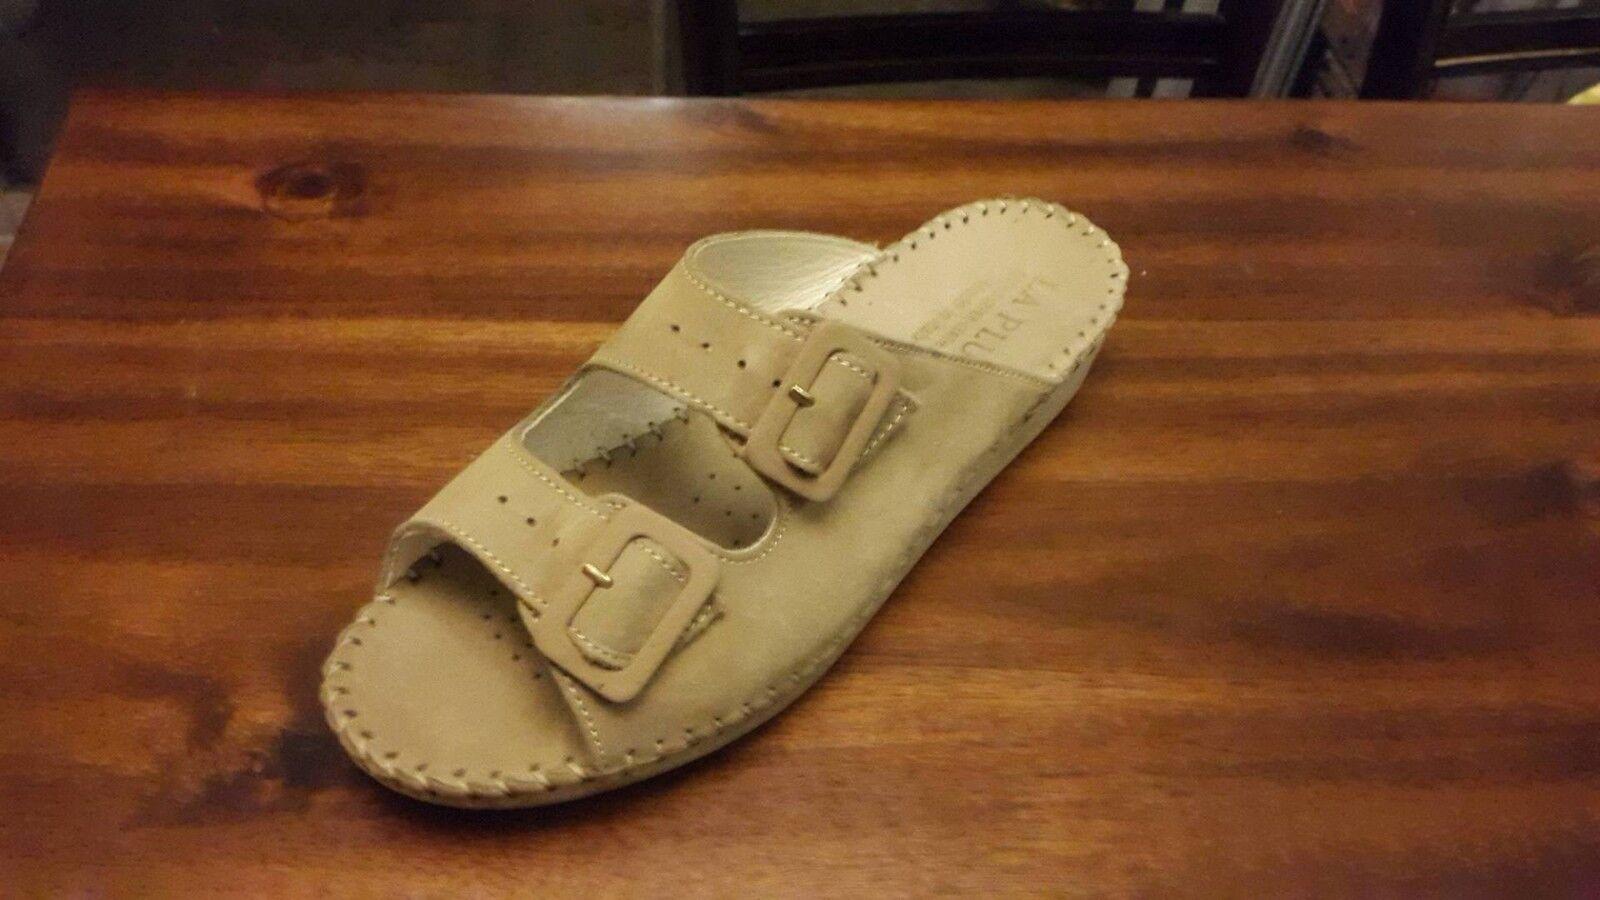 Nuevo La Plume Beige Nubuk Nubuk Beige Para mujeres Sandalias Zapatos 34308e